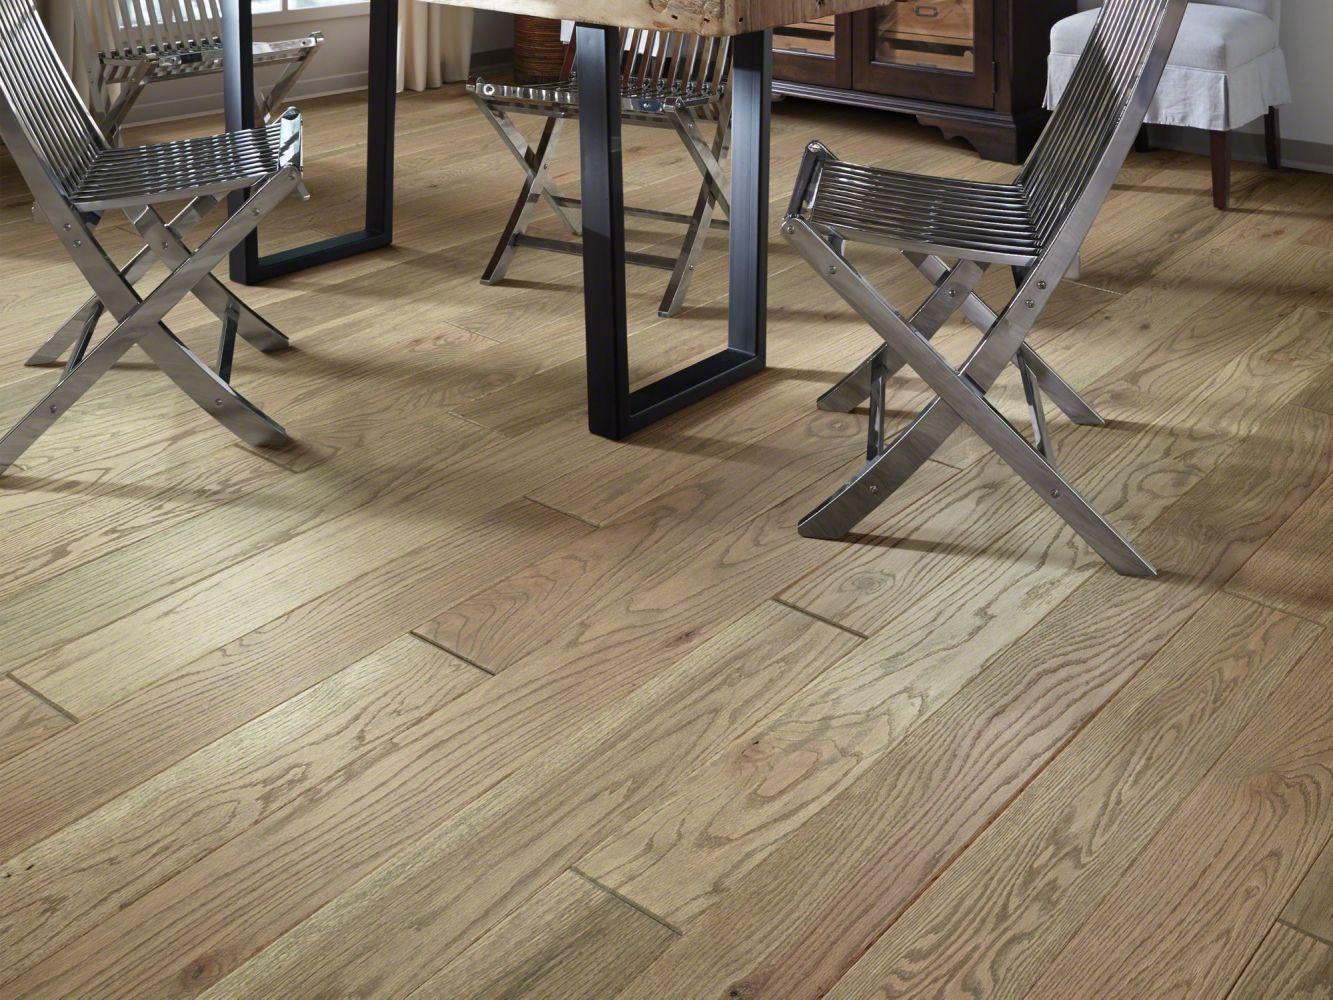 Shaw Floors Home Fn Gold Hardwood Trailhead Shoreline 02017_HW643